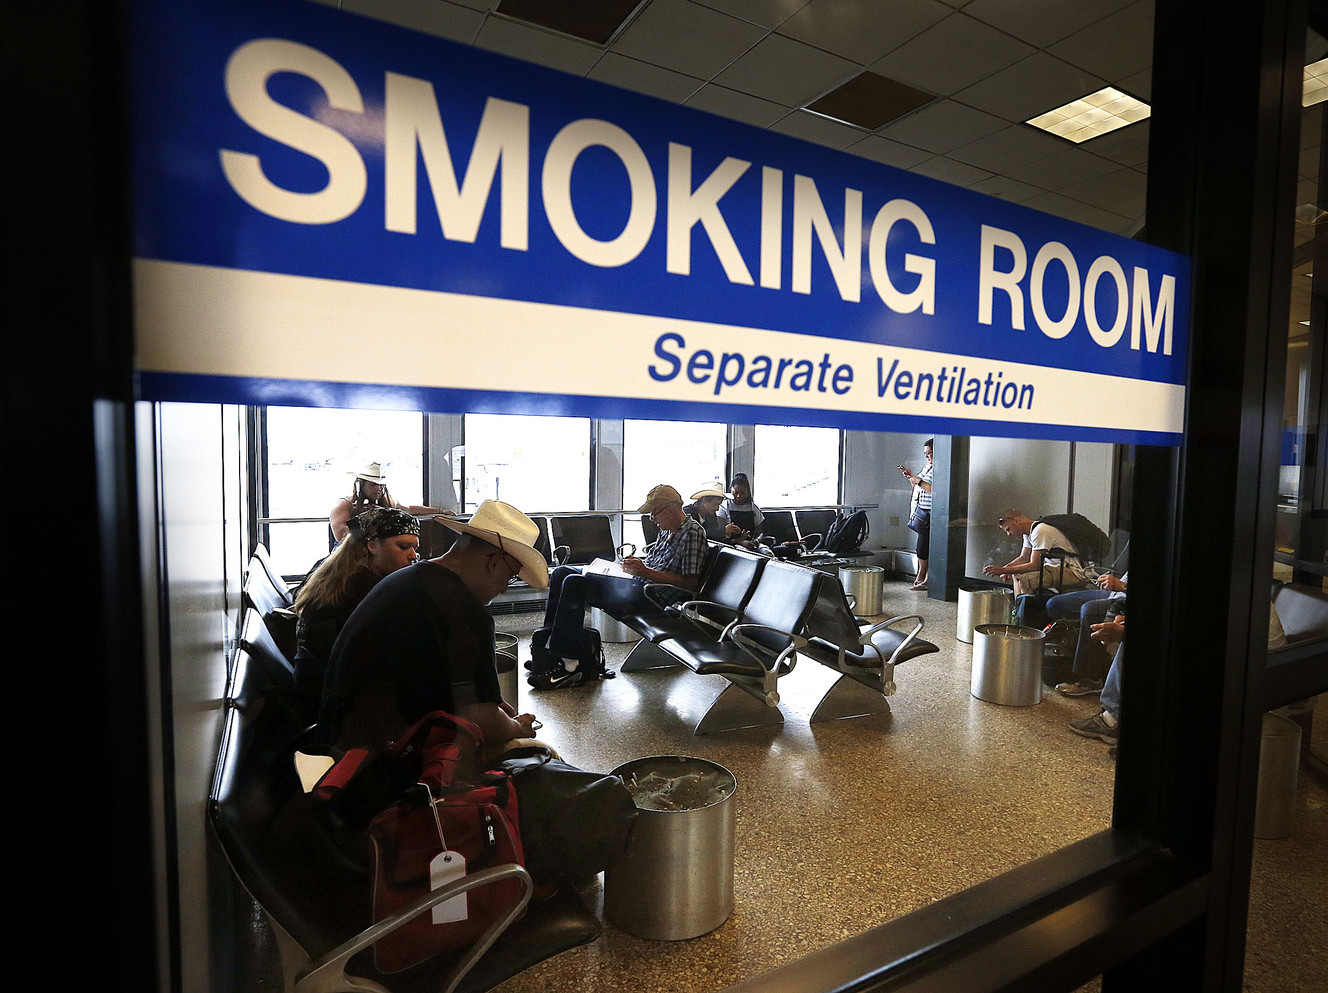 Salt Lake City to begin phasing out smoking rooms at airport